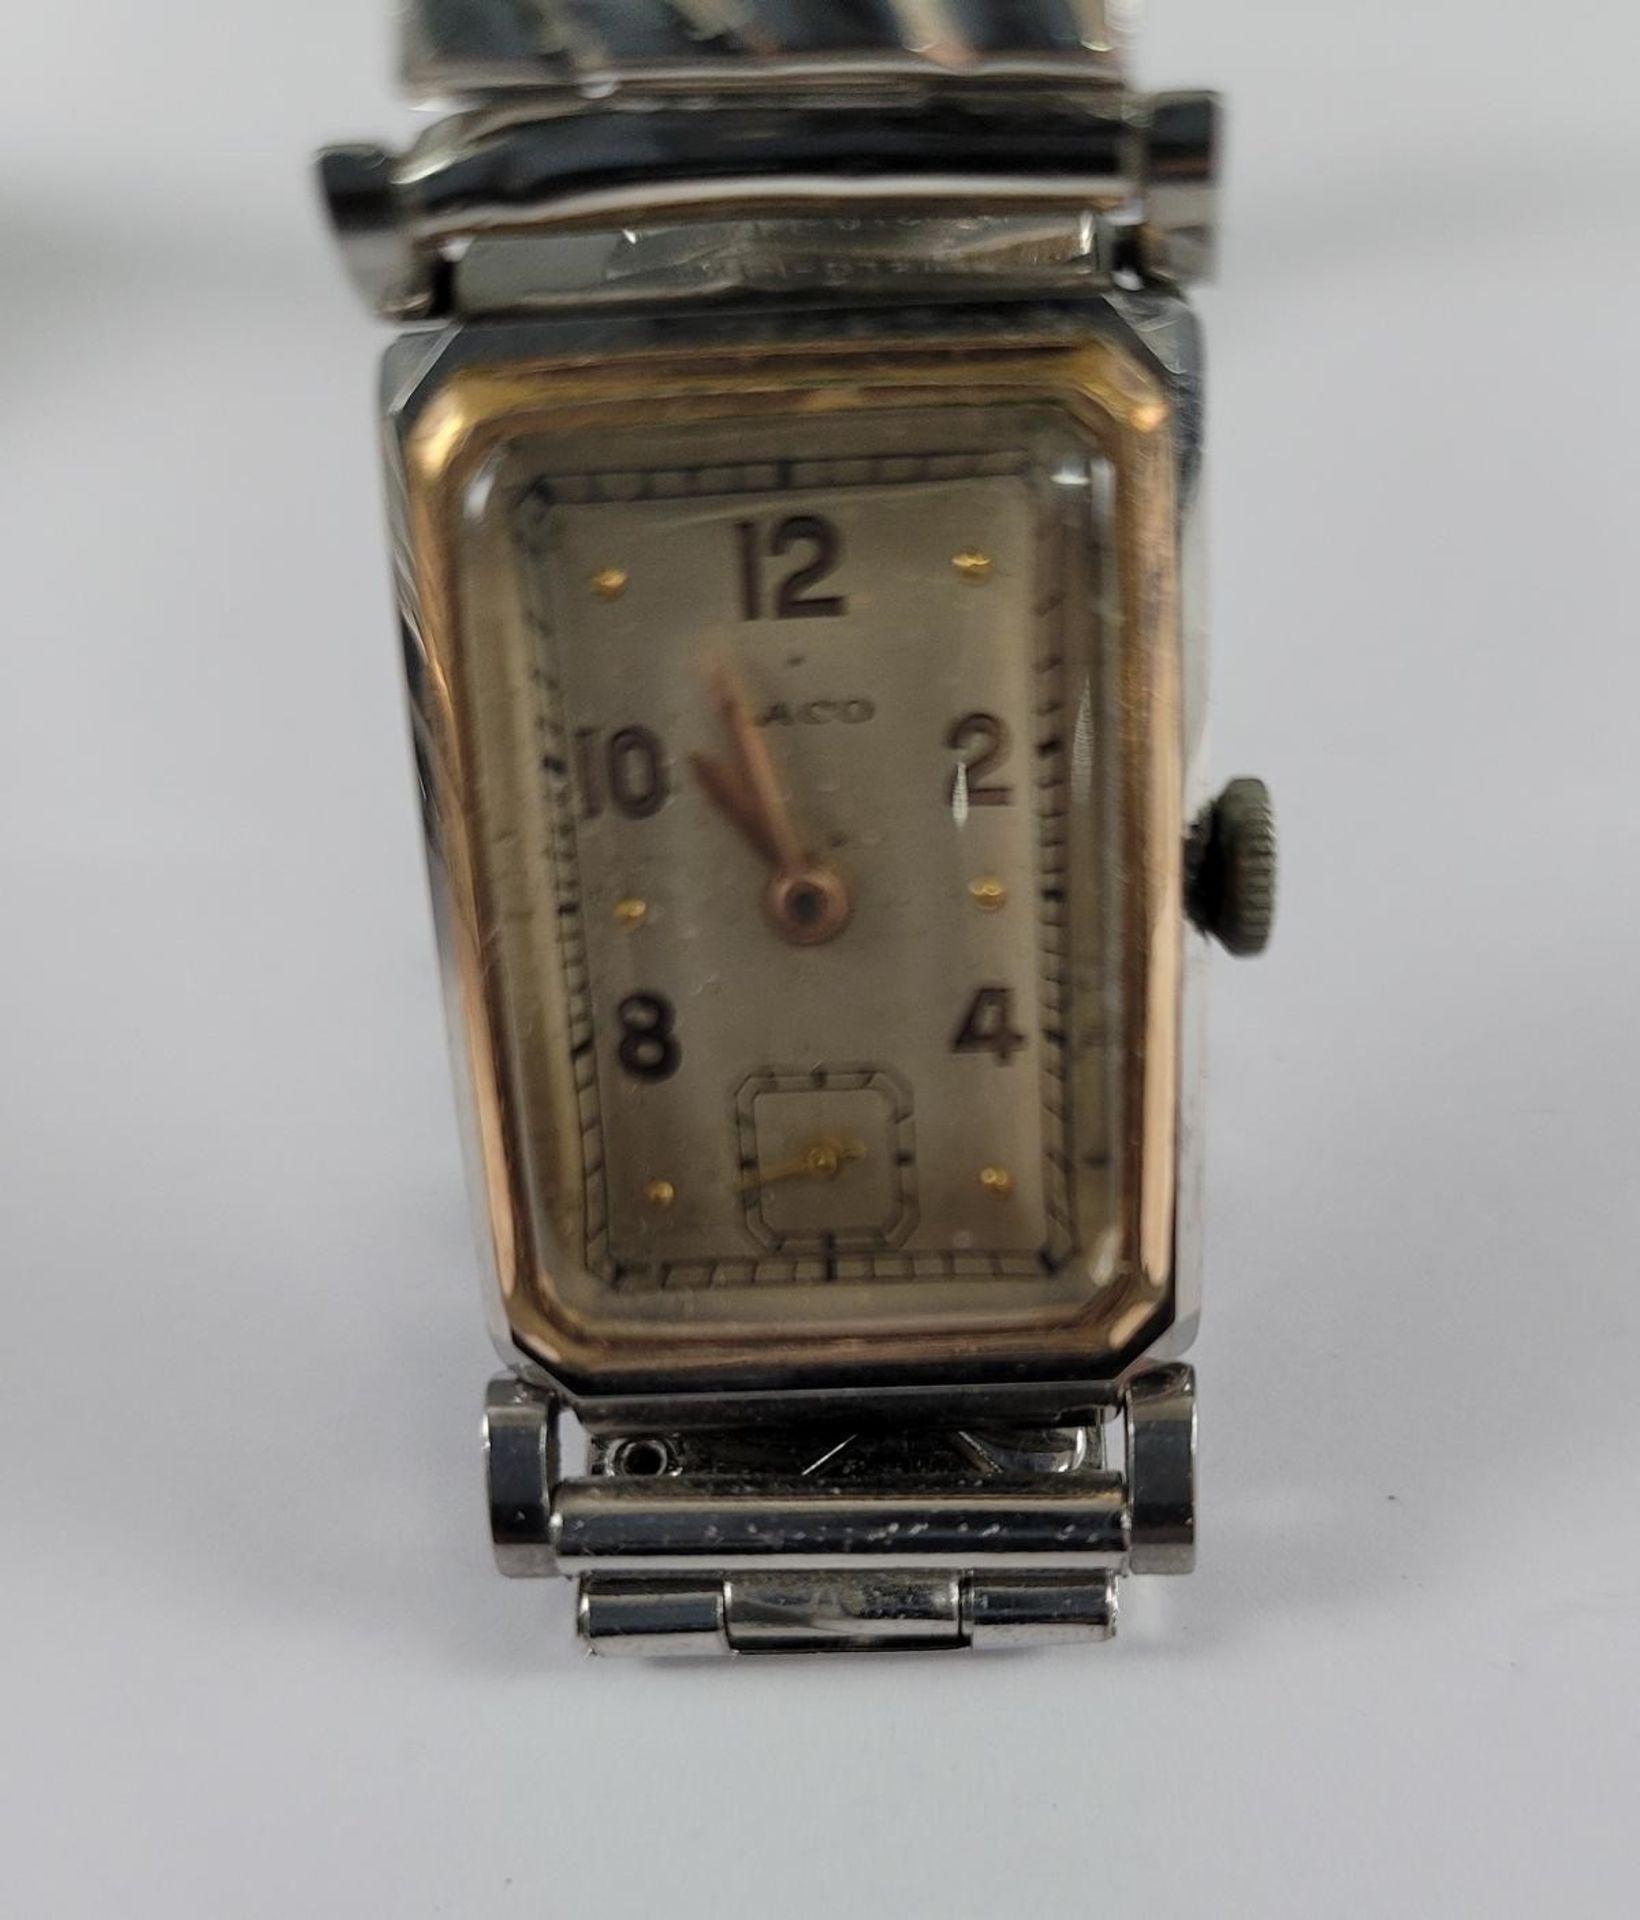 ENICAR Automatic Herrenarmbanduhr und LACO Damenarmbanduhr - Bild 4 aus 4